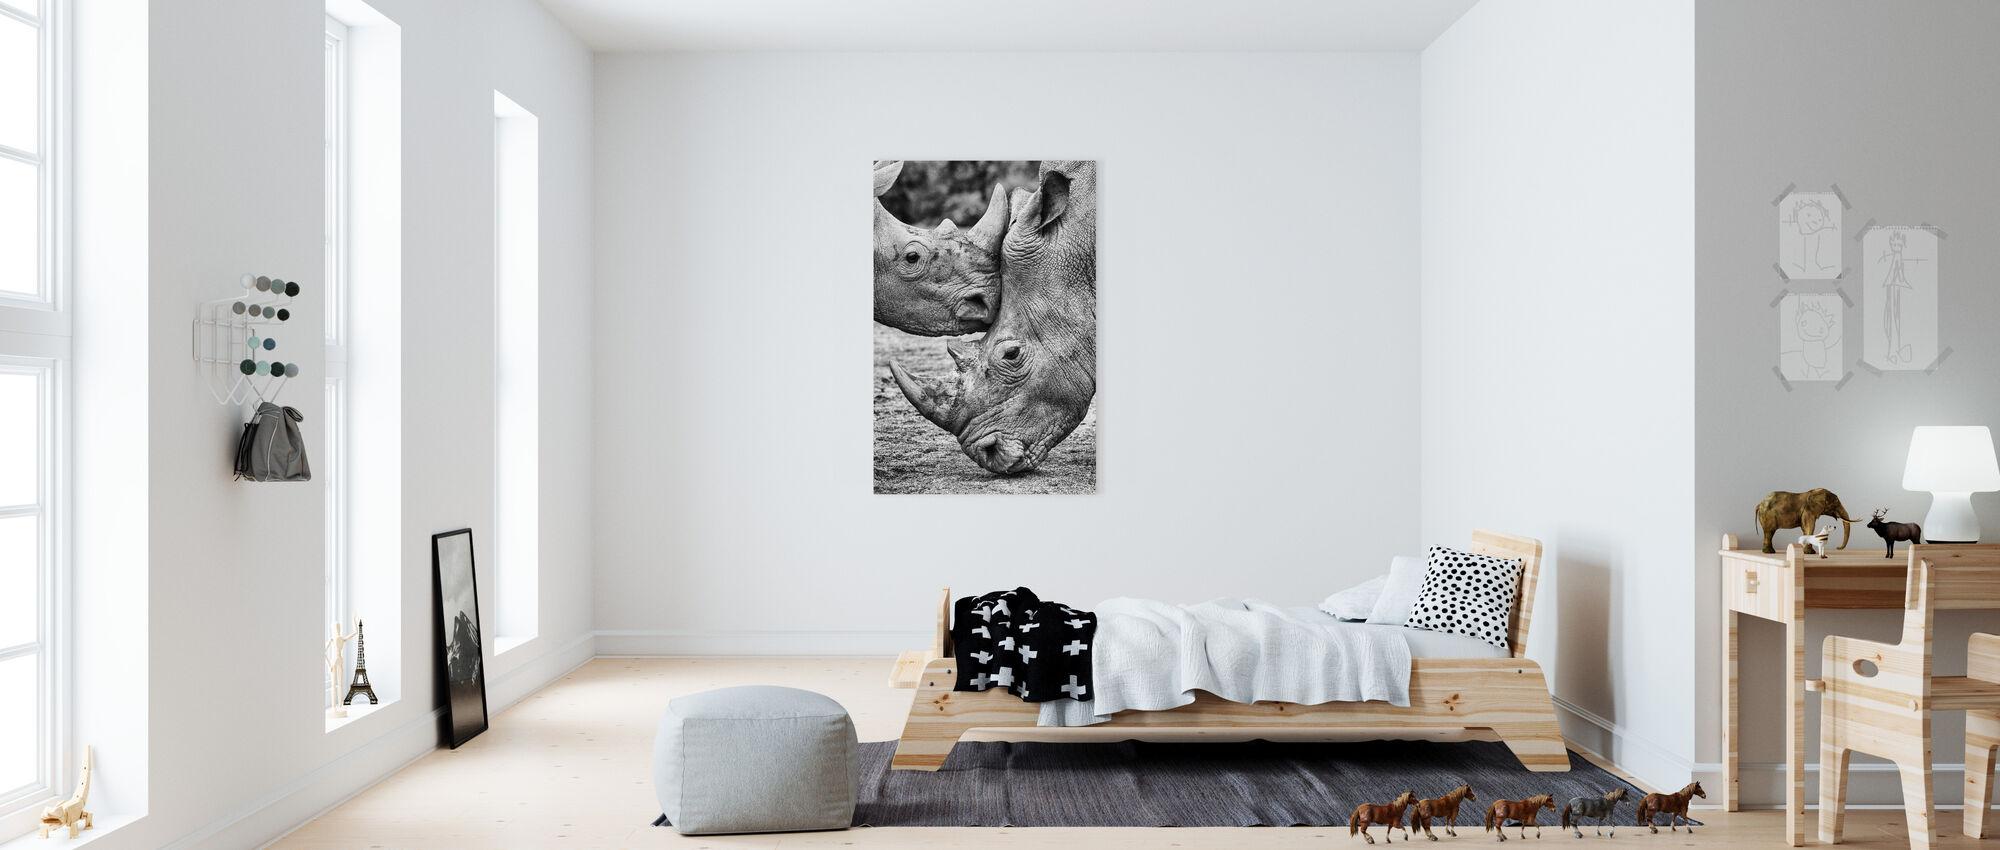 Gezicht tot Gezicht - Canvas print - Kinderkamer